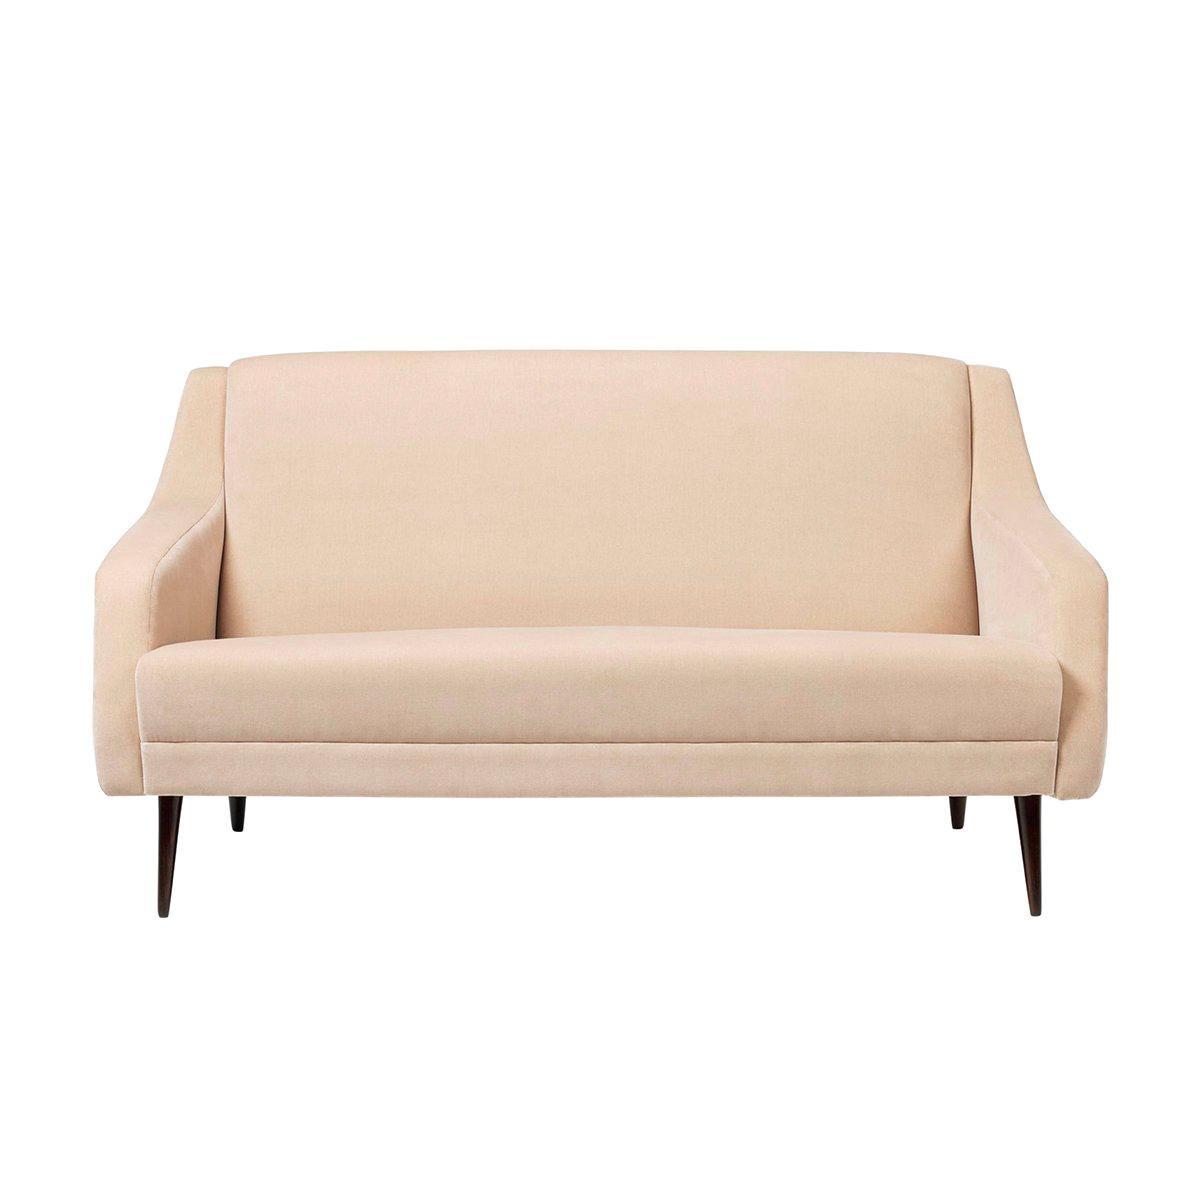 Carlo de Carli Re-Edition Mid-Century Modern 2 Person Sofa